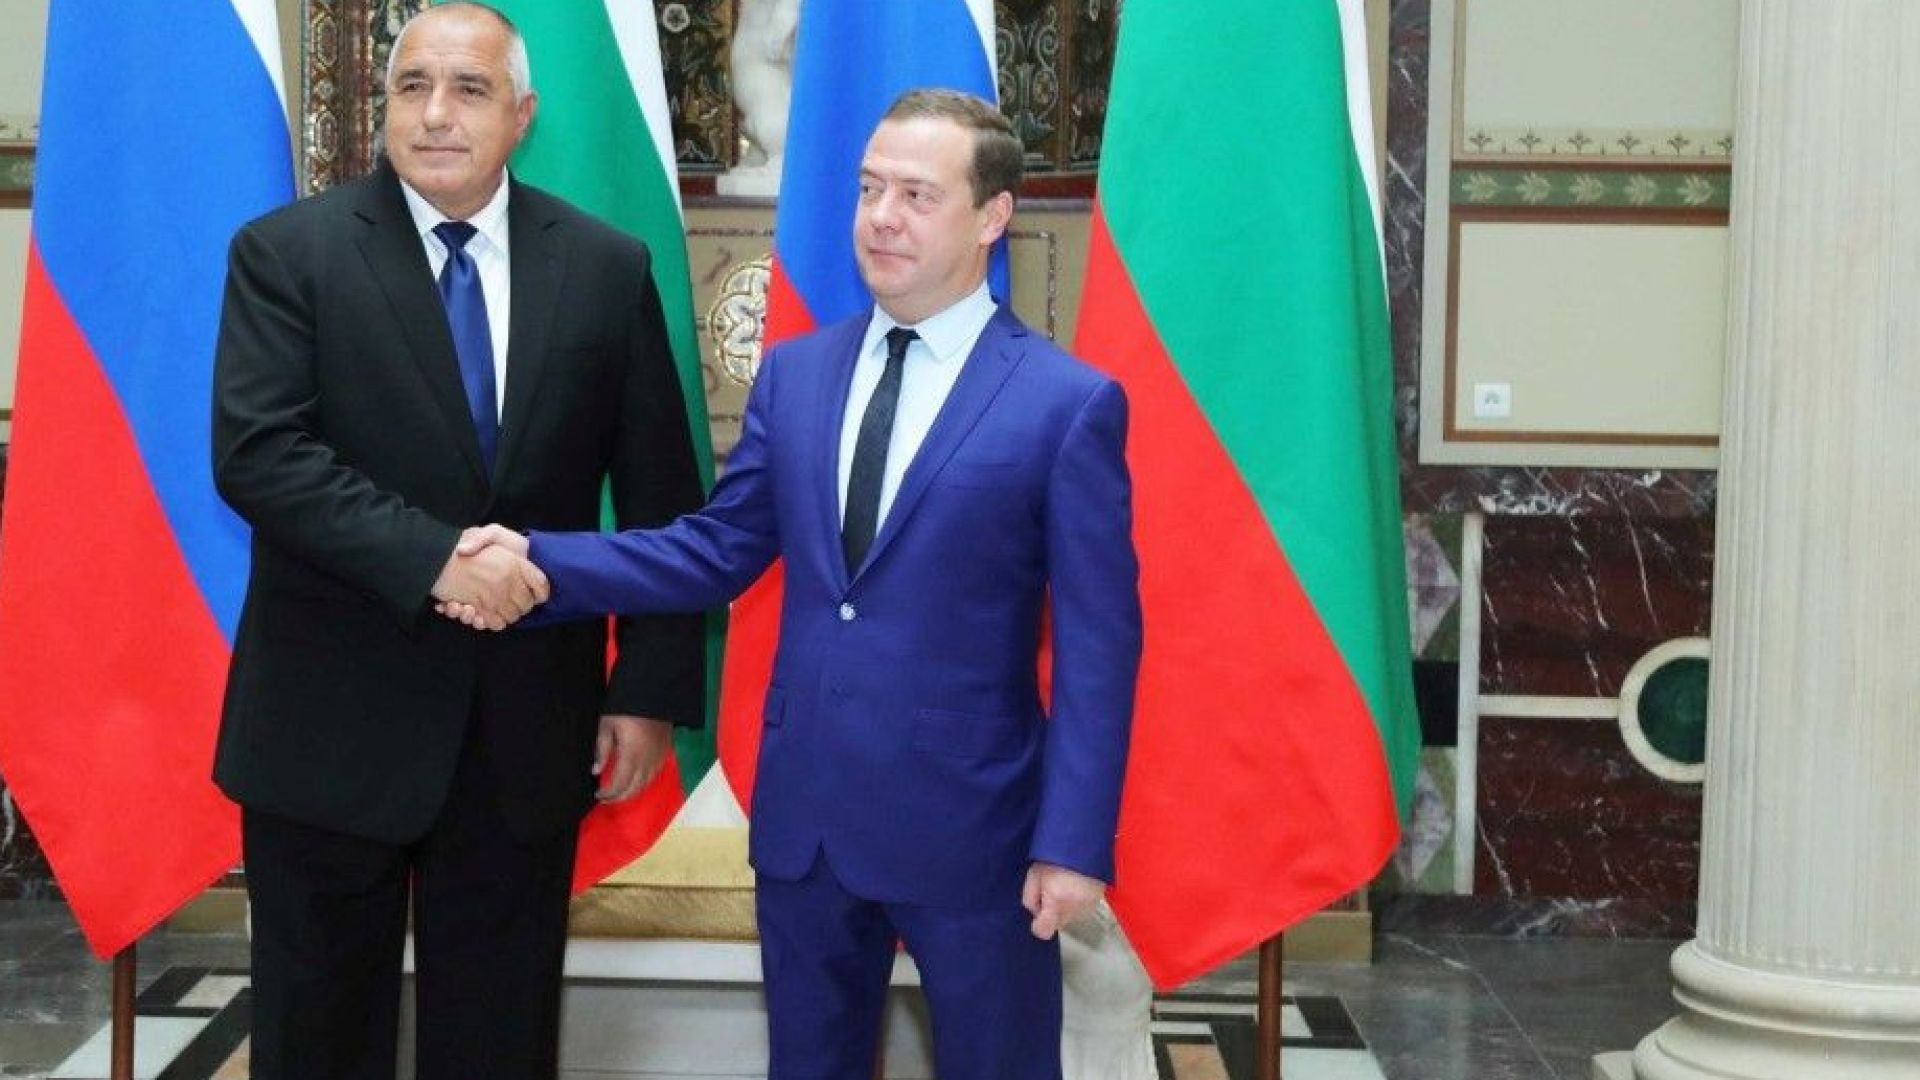 Медведев и Ердоган поздравиха Борисов за 3 март, Путин и Тръмп - Радев